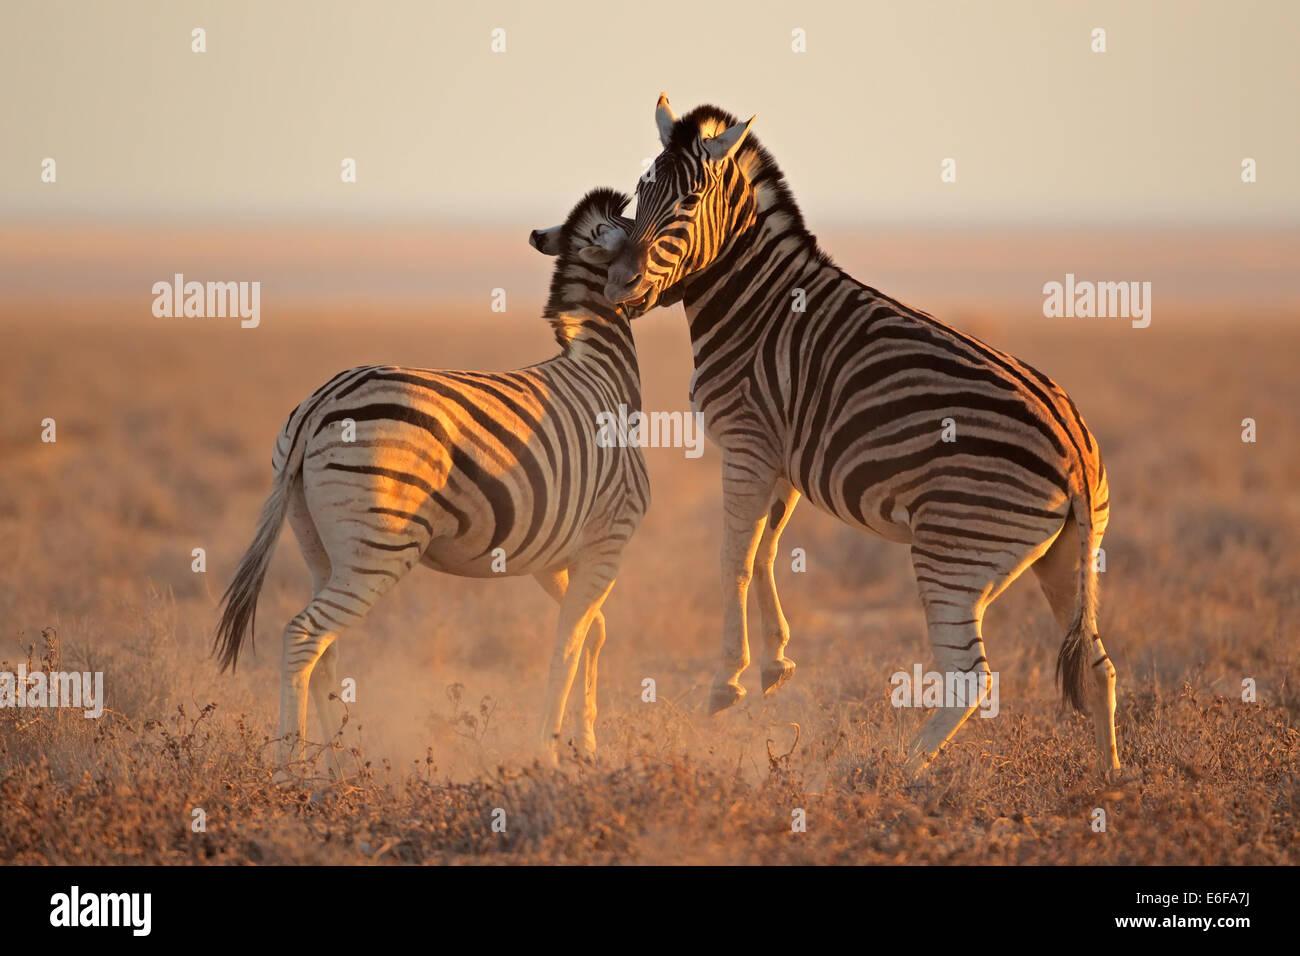 Two Plains (Burchells) Zebra stallions (Equus burchelli) fighting, Etosha National Park, Namibia - Stock Image